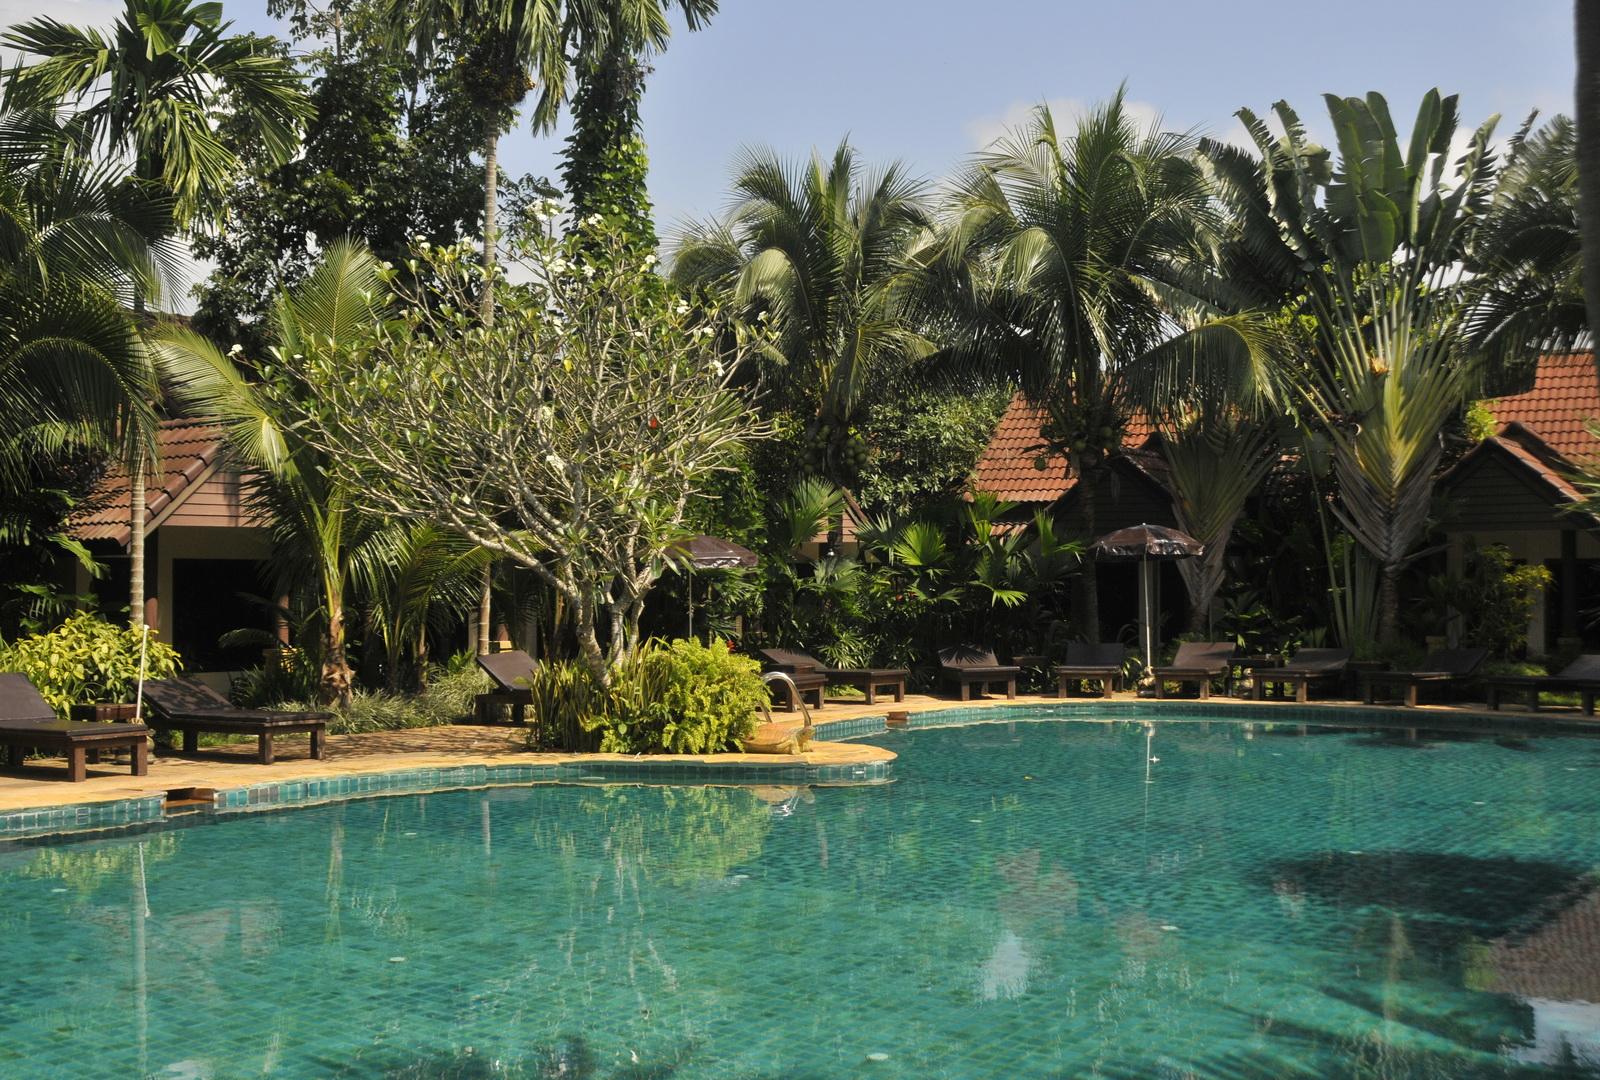 Thailand, Laluna Hotel, Chiang Rai